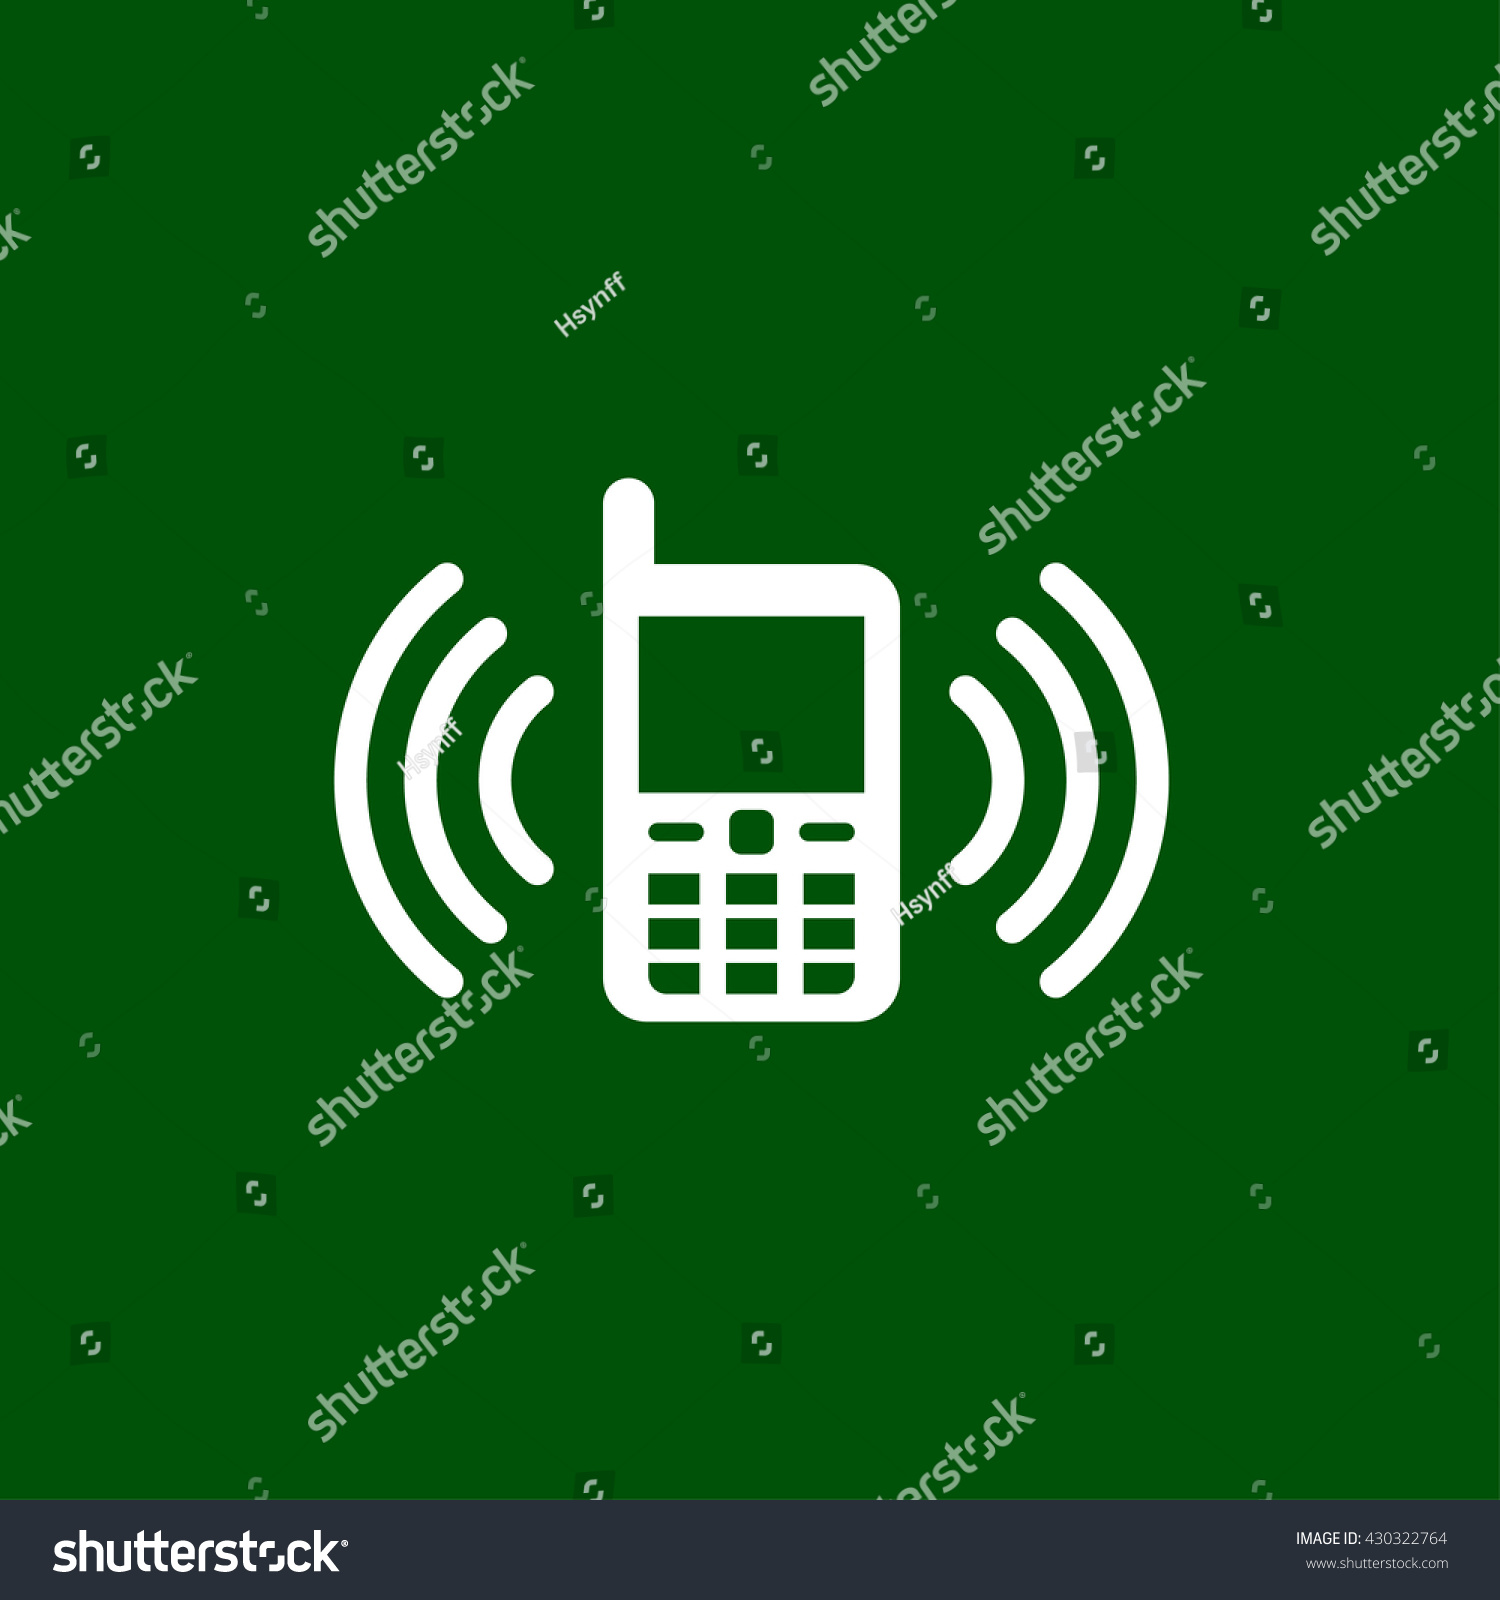 Phone Vibration Icon Phone Vibration Vector Stock Photo (Photo ...